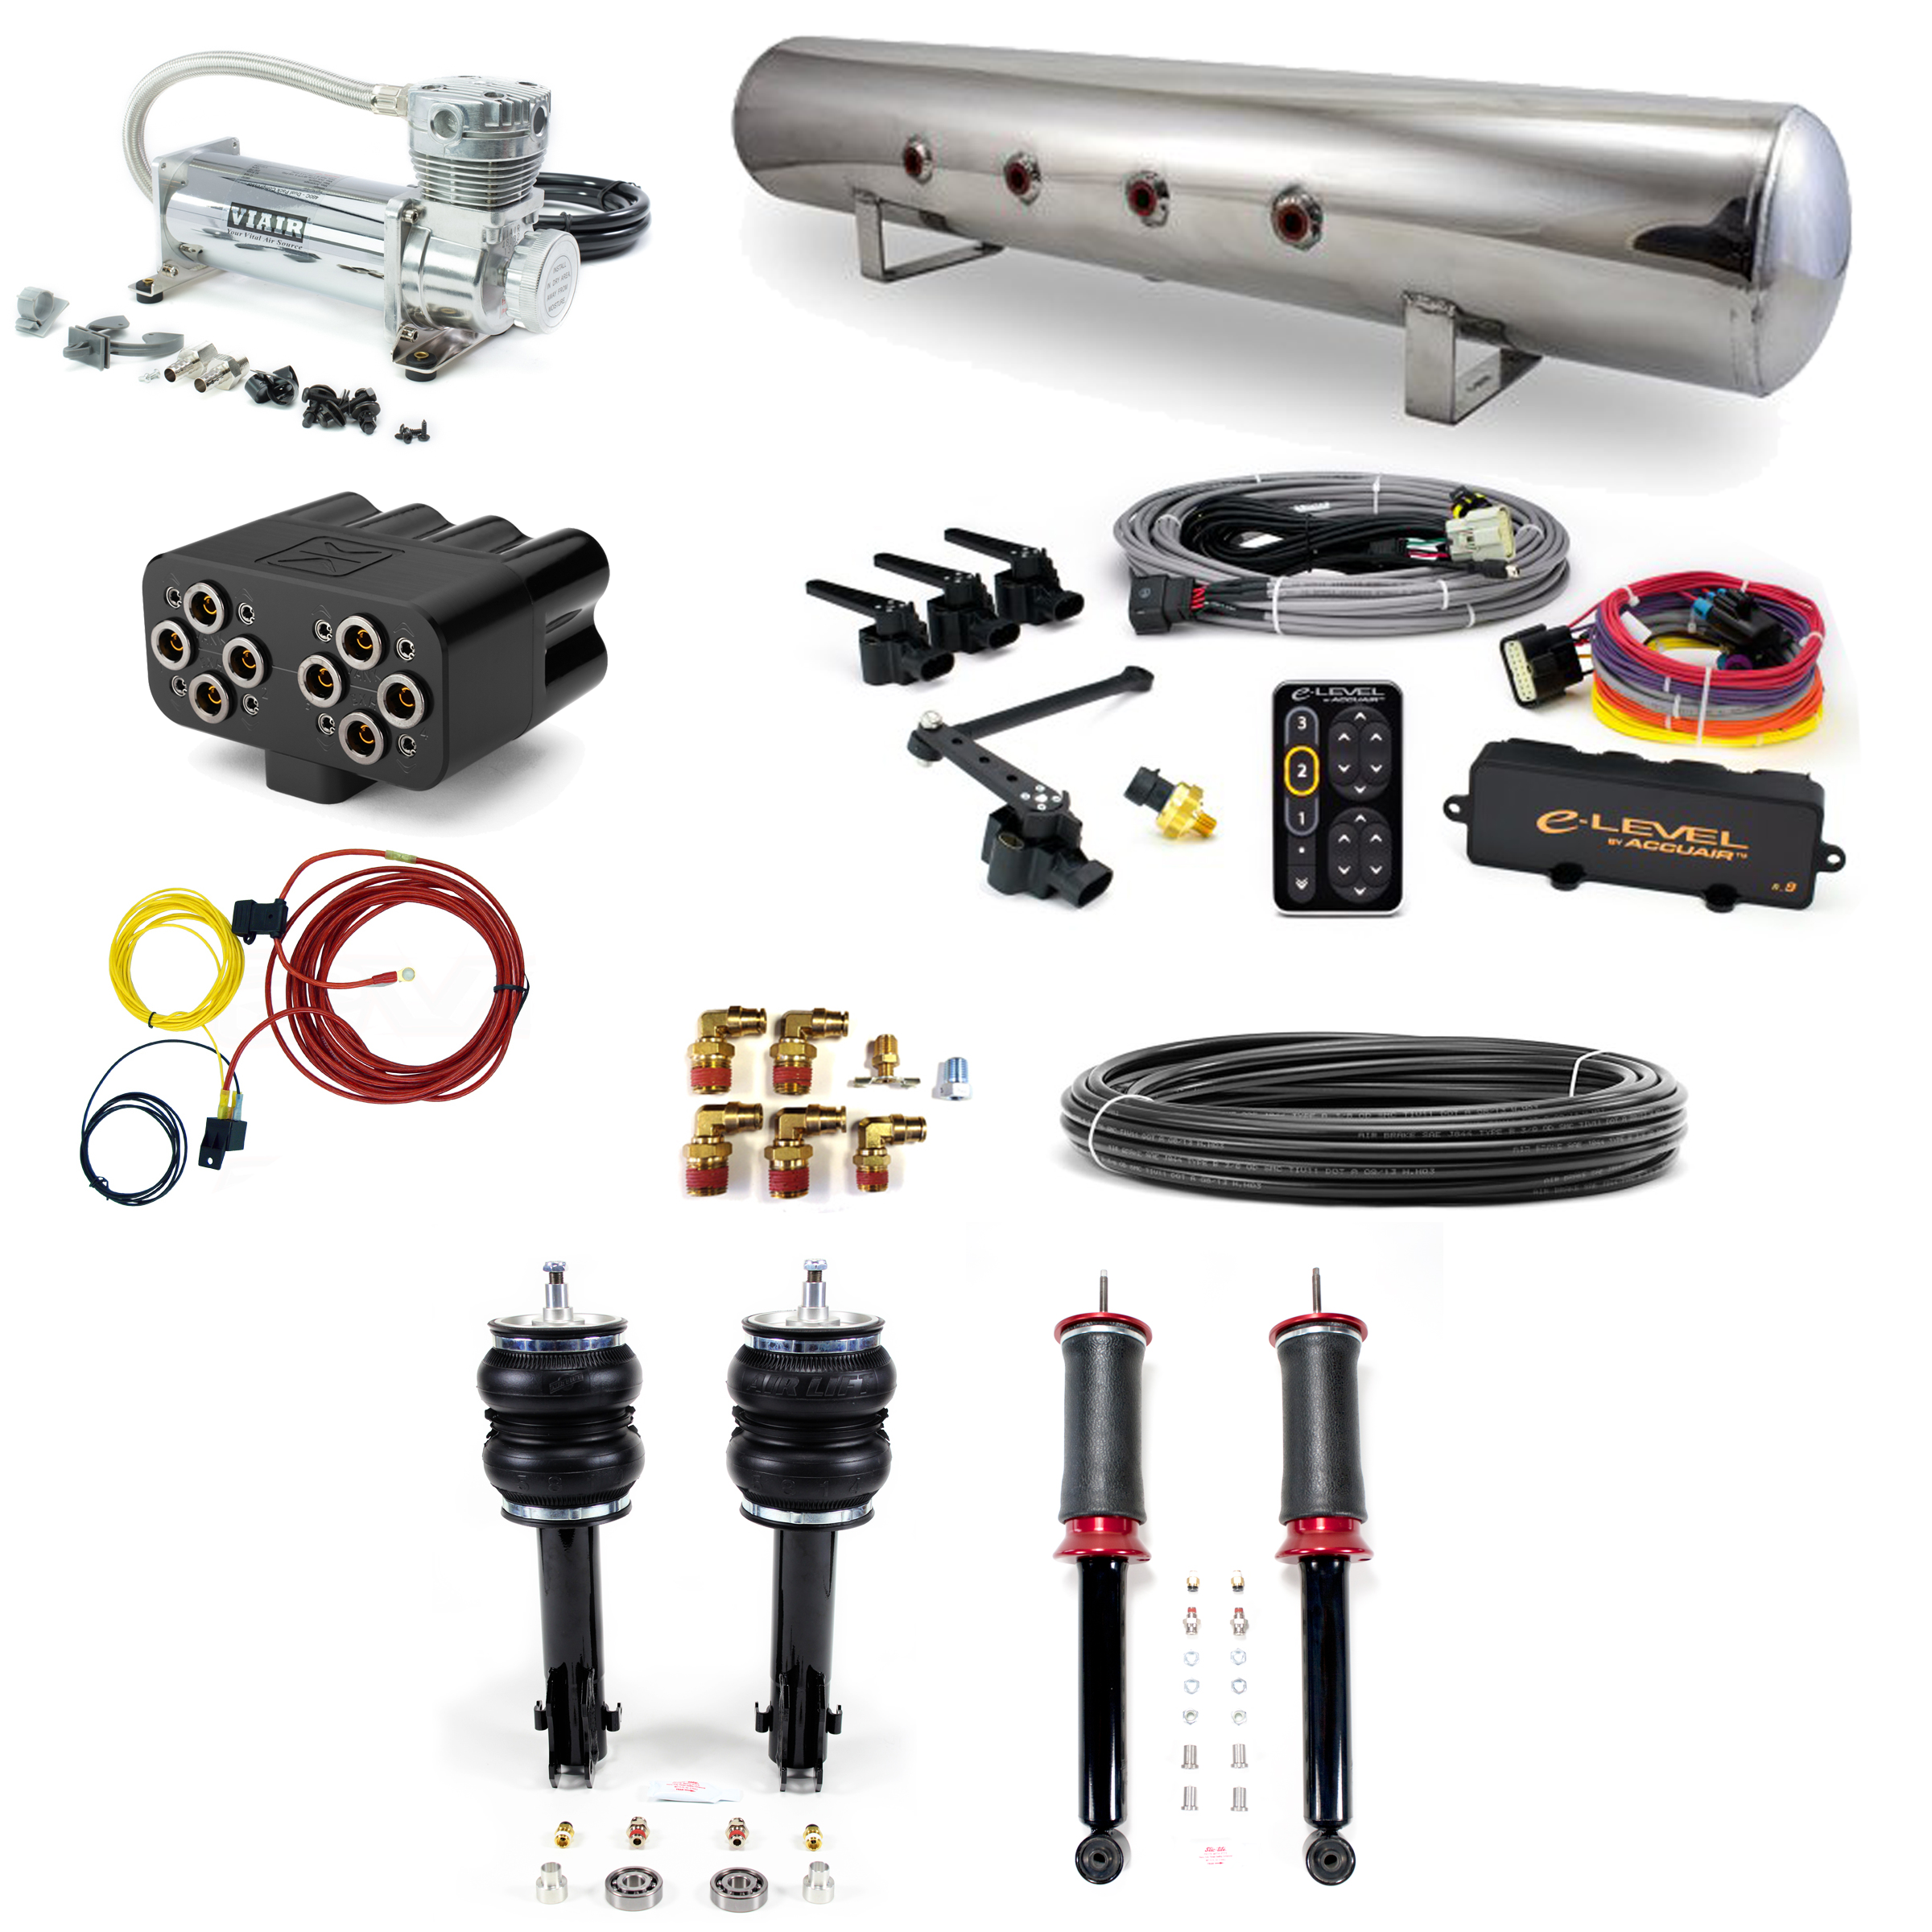 platform > accuair stage 3 air suspension system - mkii-iii platform:  85-96 vw corrado, 85-98 vw golf, 85-98 vw jetta, 90-97 vw passat, 95-03 vw  cabrio